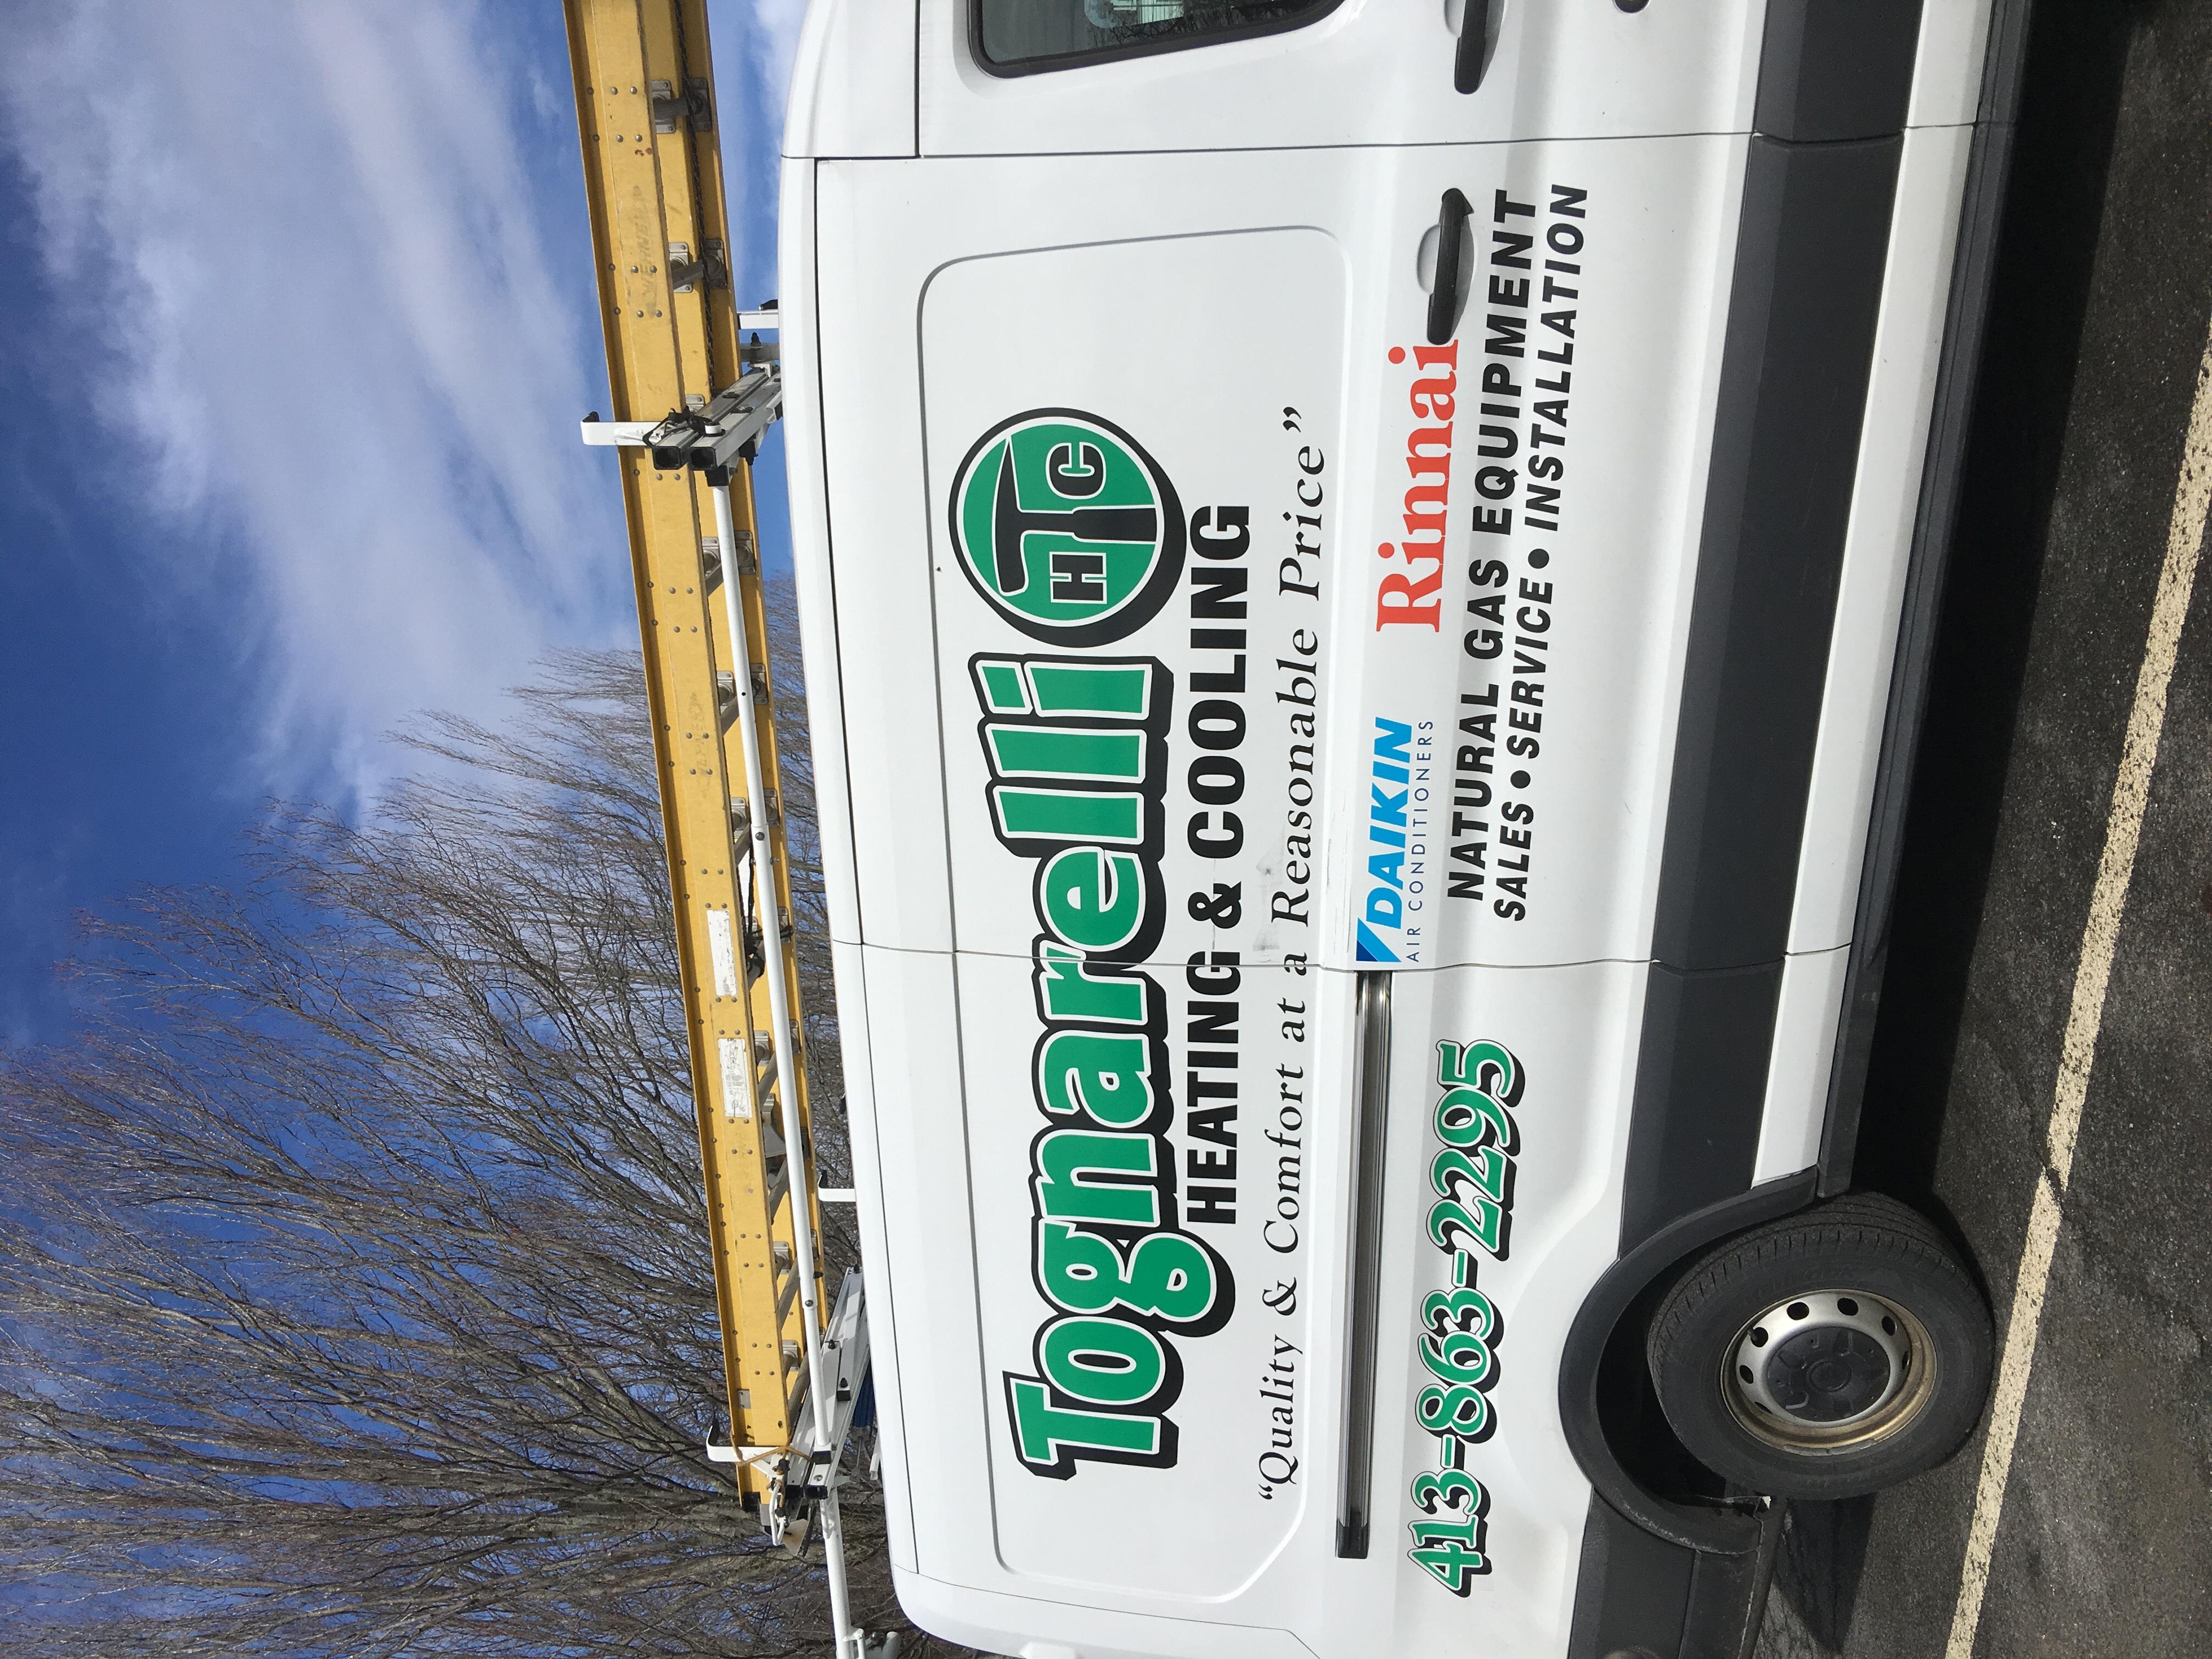 Tognarelli Heating & Cooling 85 Pierce St, Greenfield, MA ...